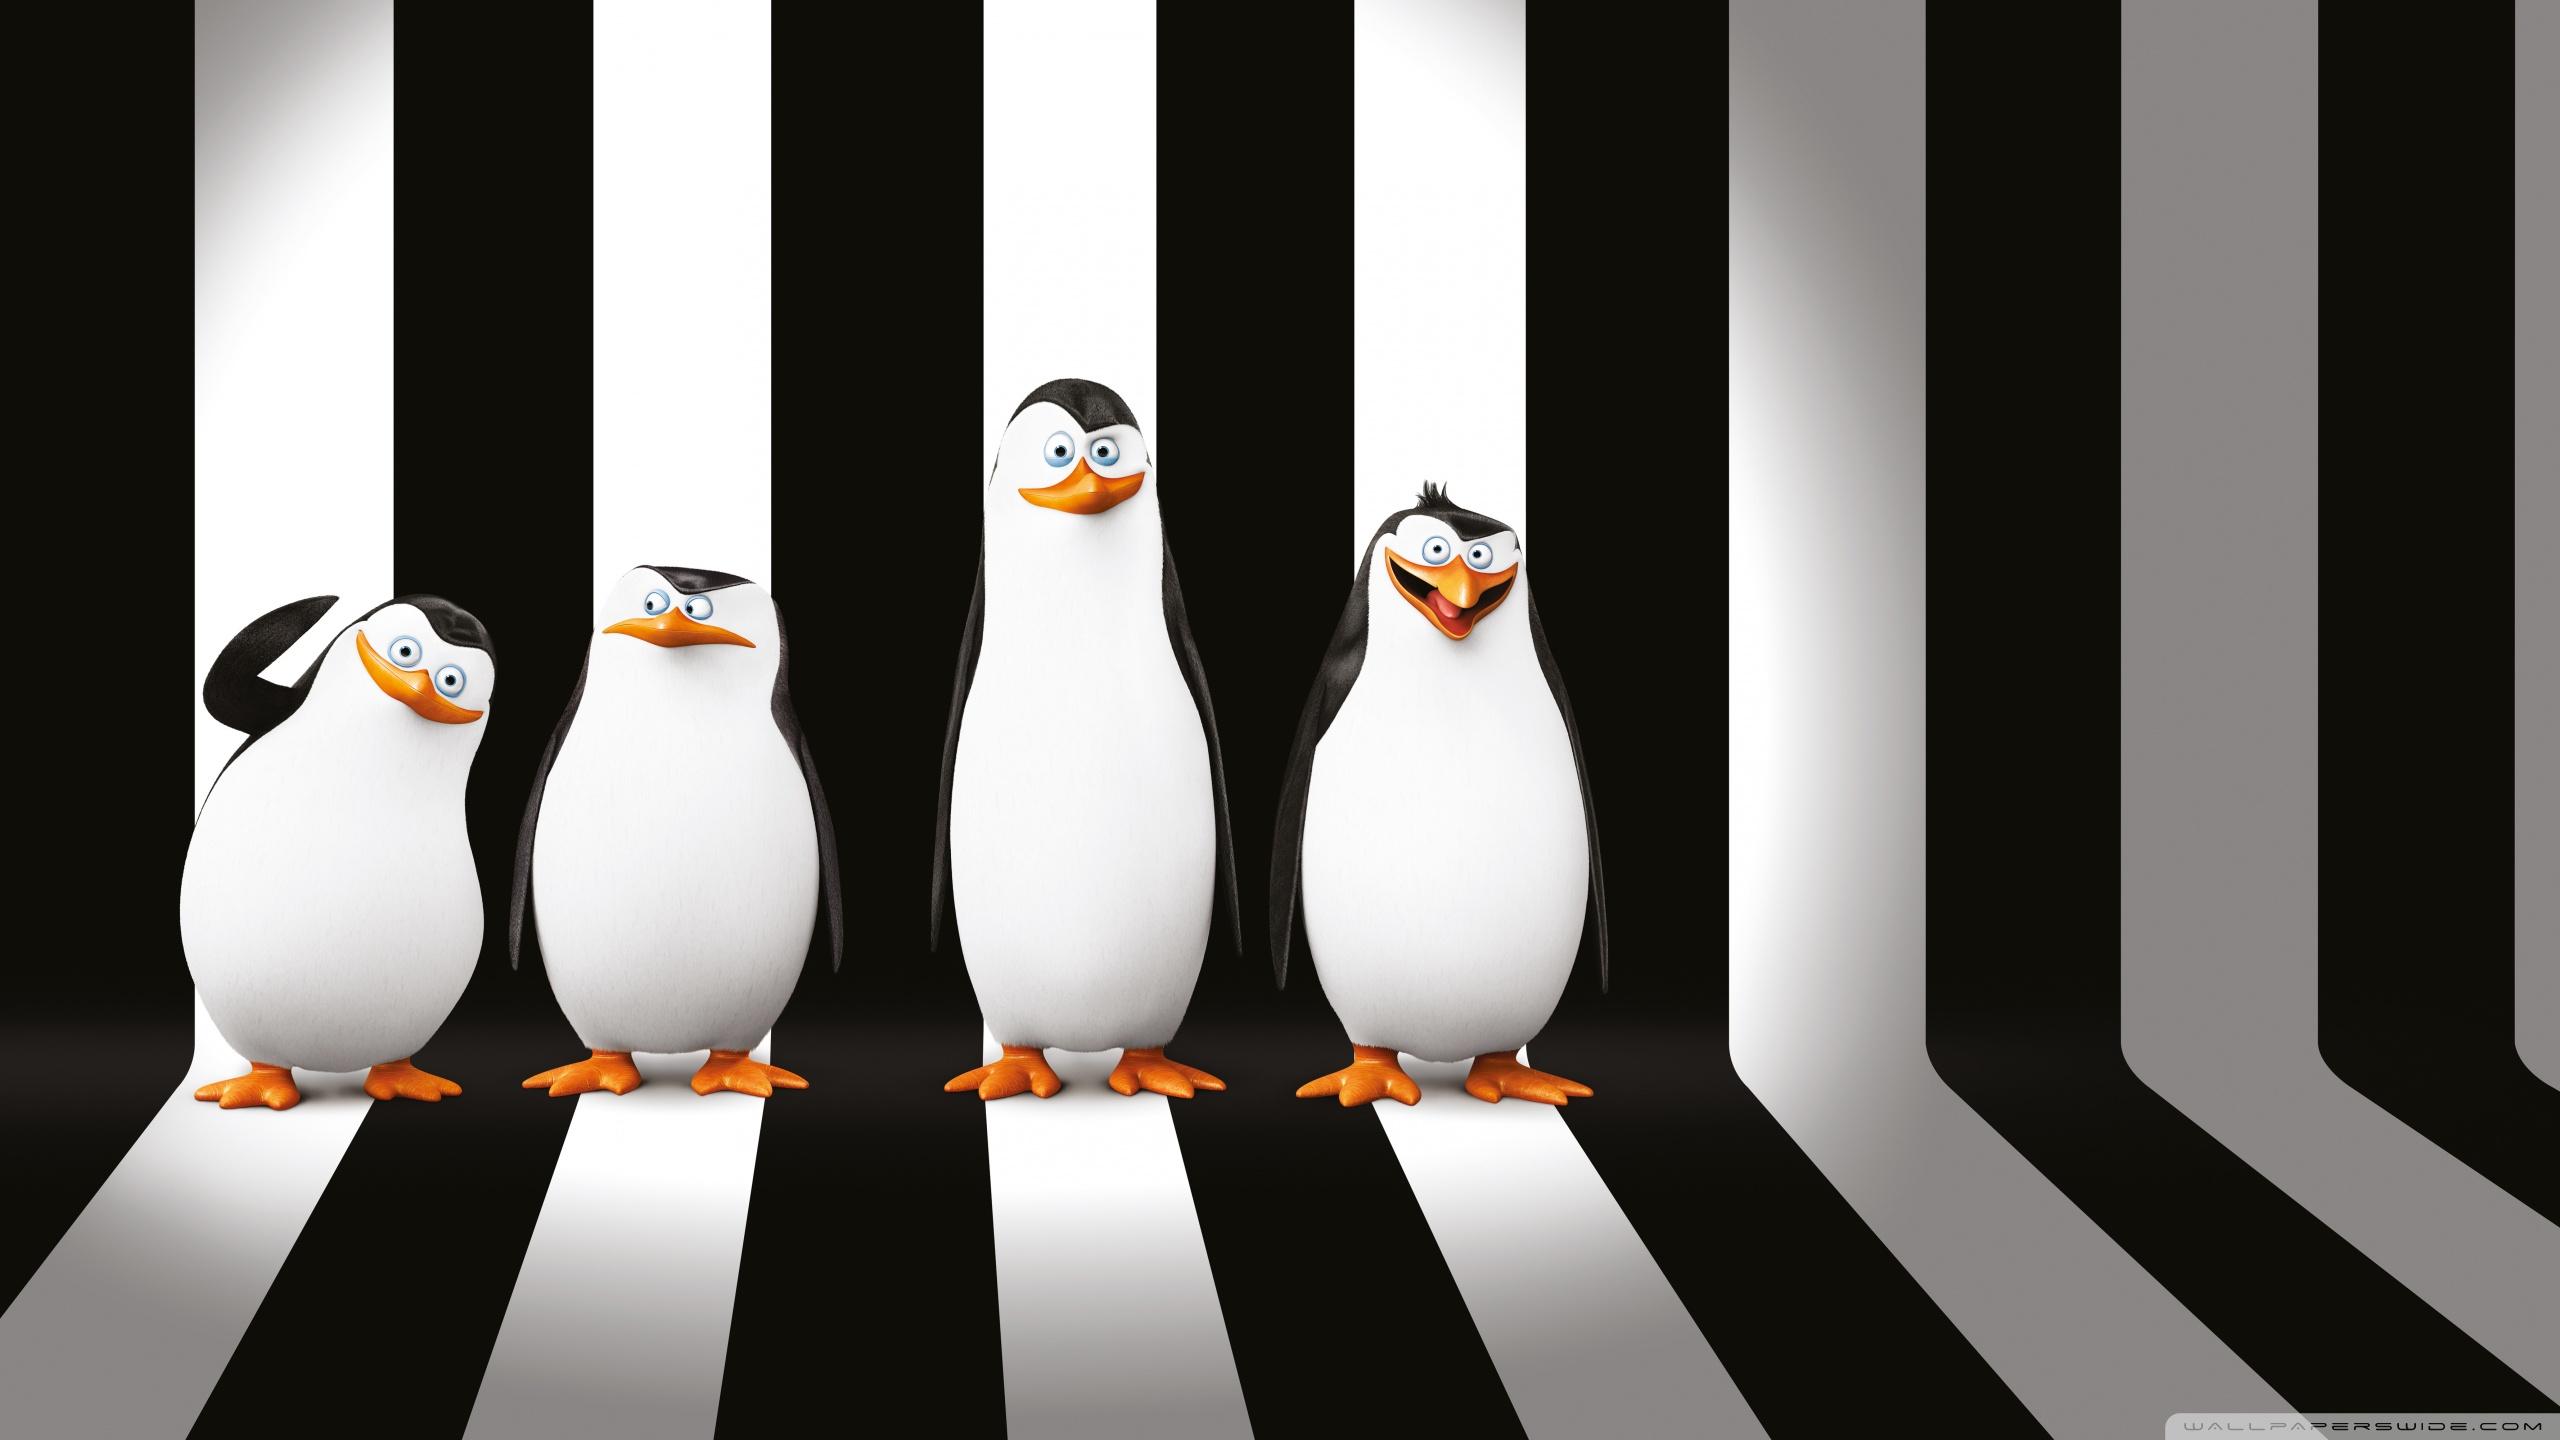 penguins of madagascar movie ❤ uhd desktop wallpaper for ultra hd